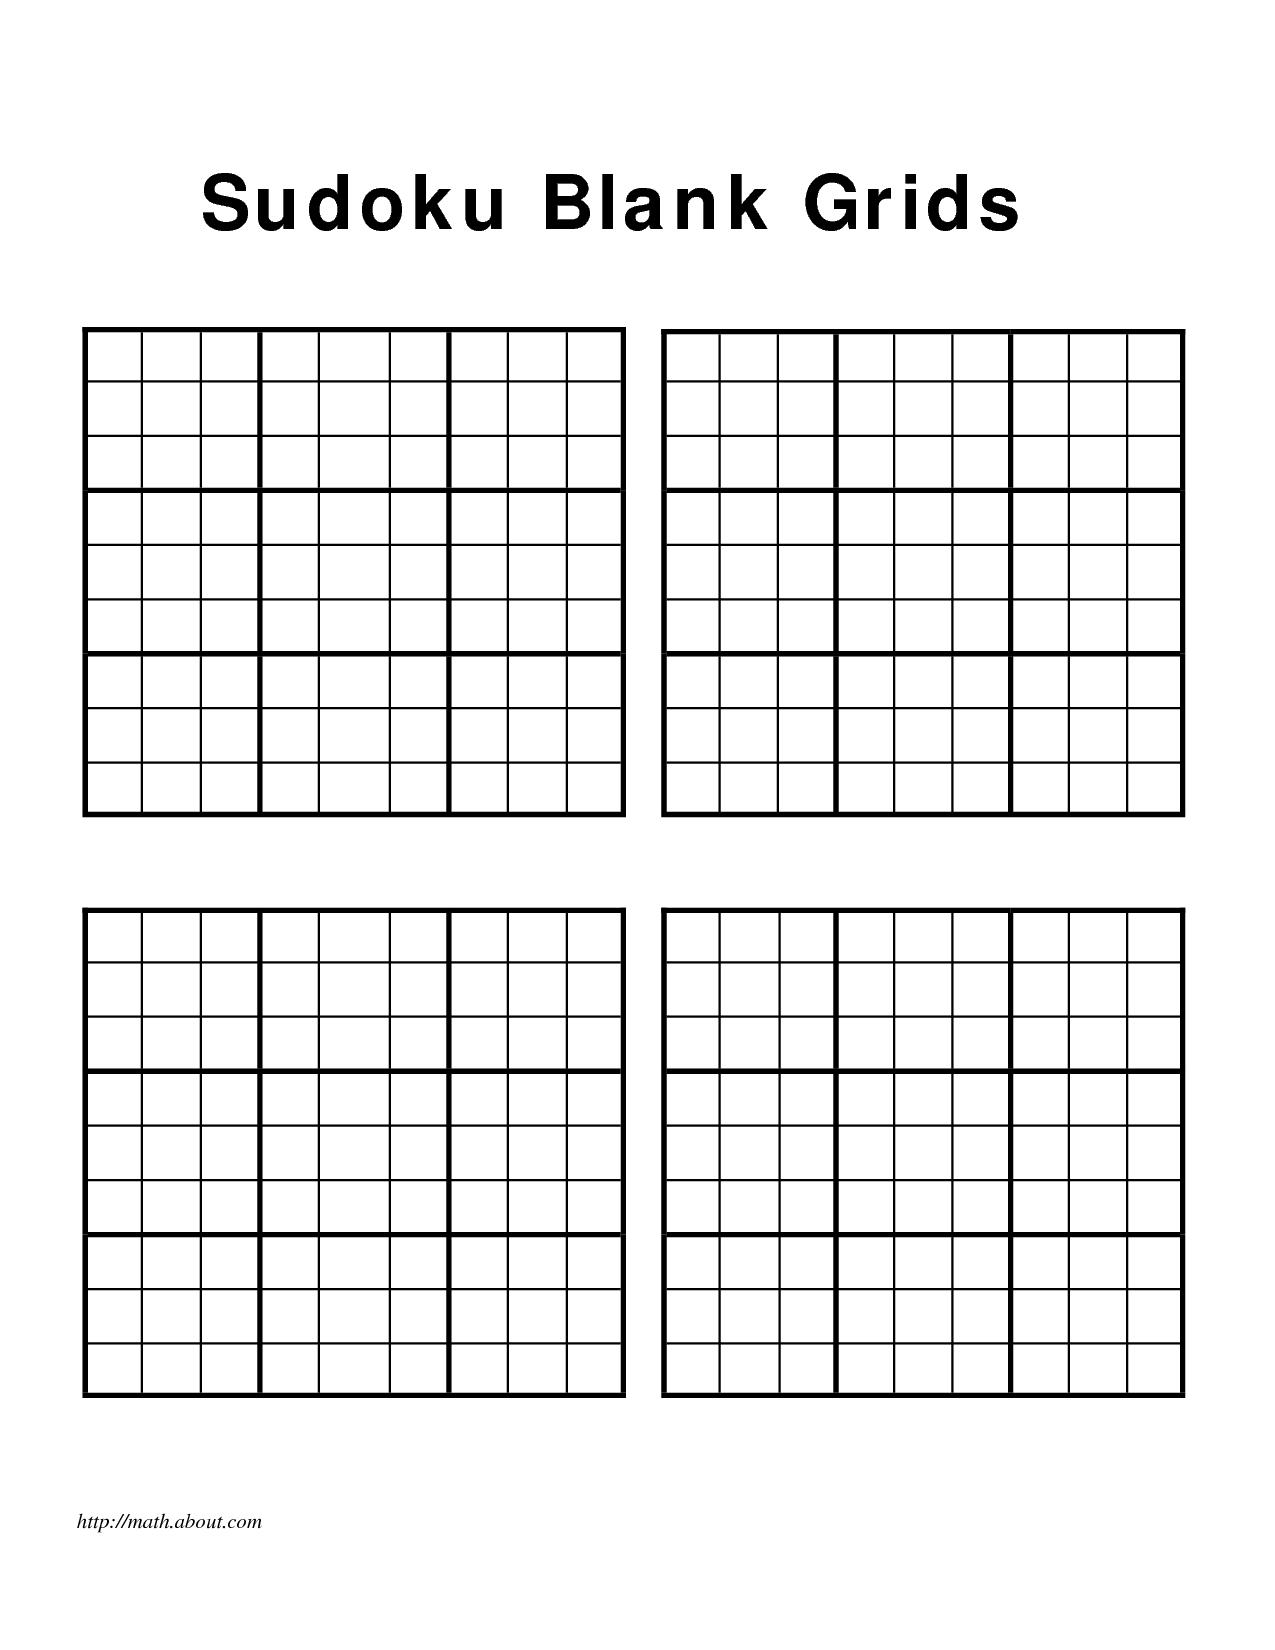 Sudoku Grids Pdf - Falep.midnightpig.co